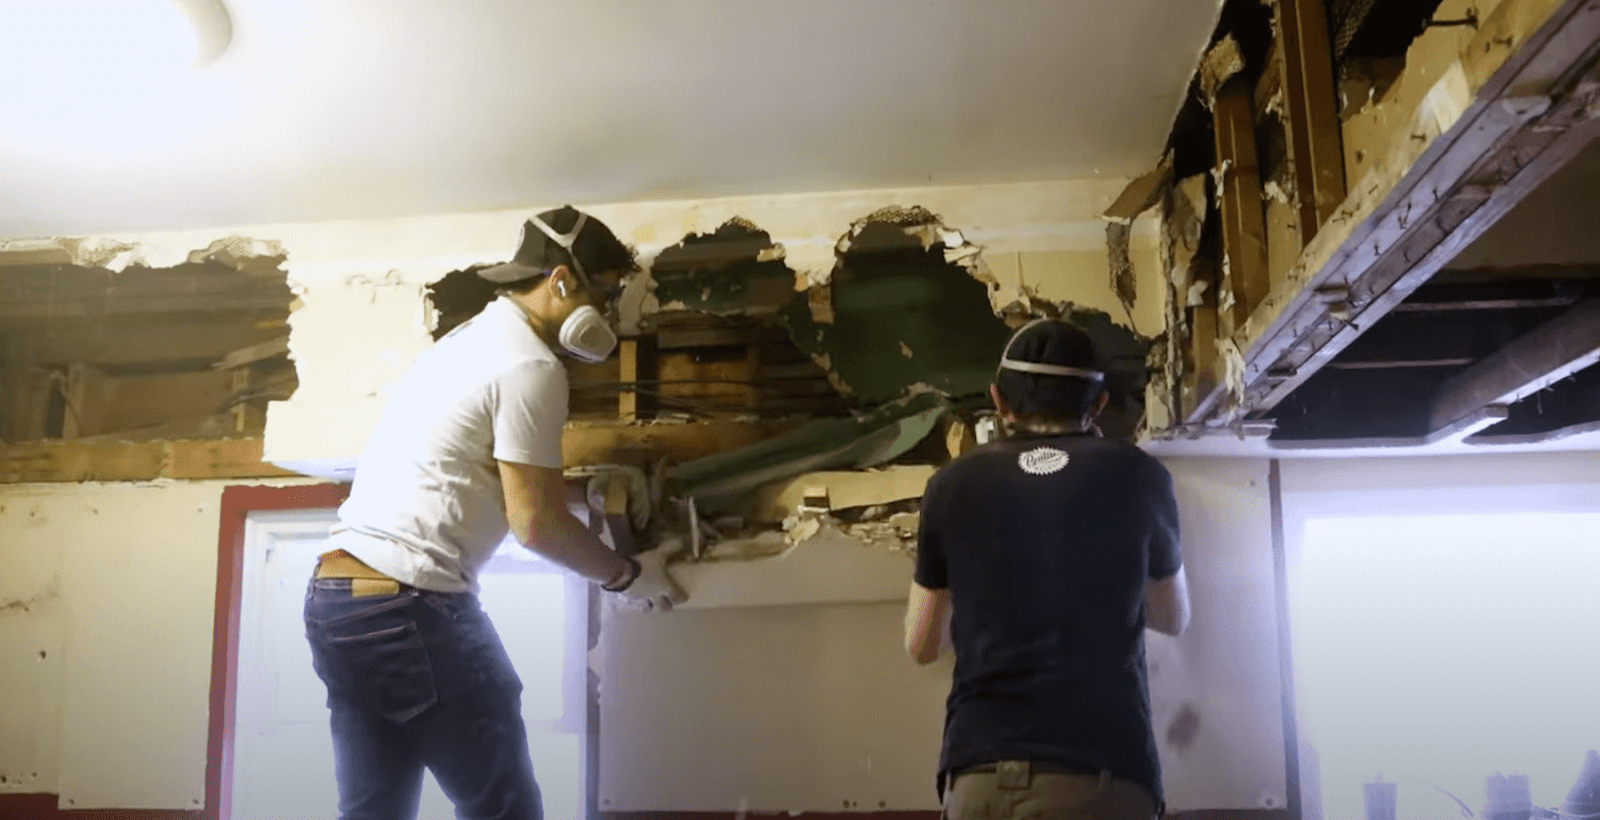 Sam and Jordan tearing down walls